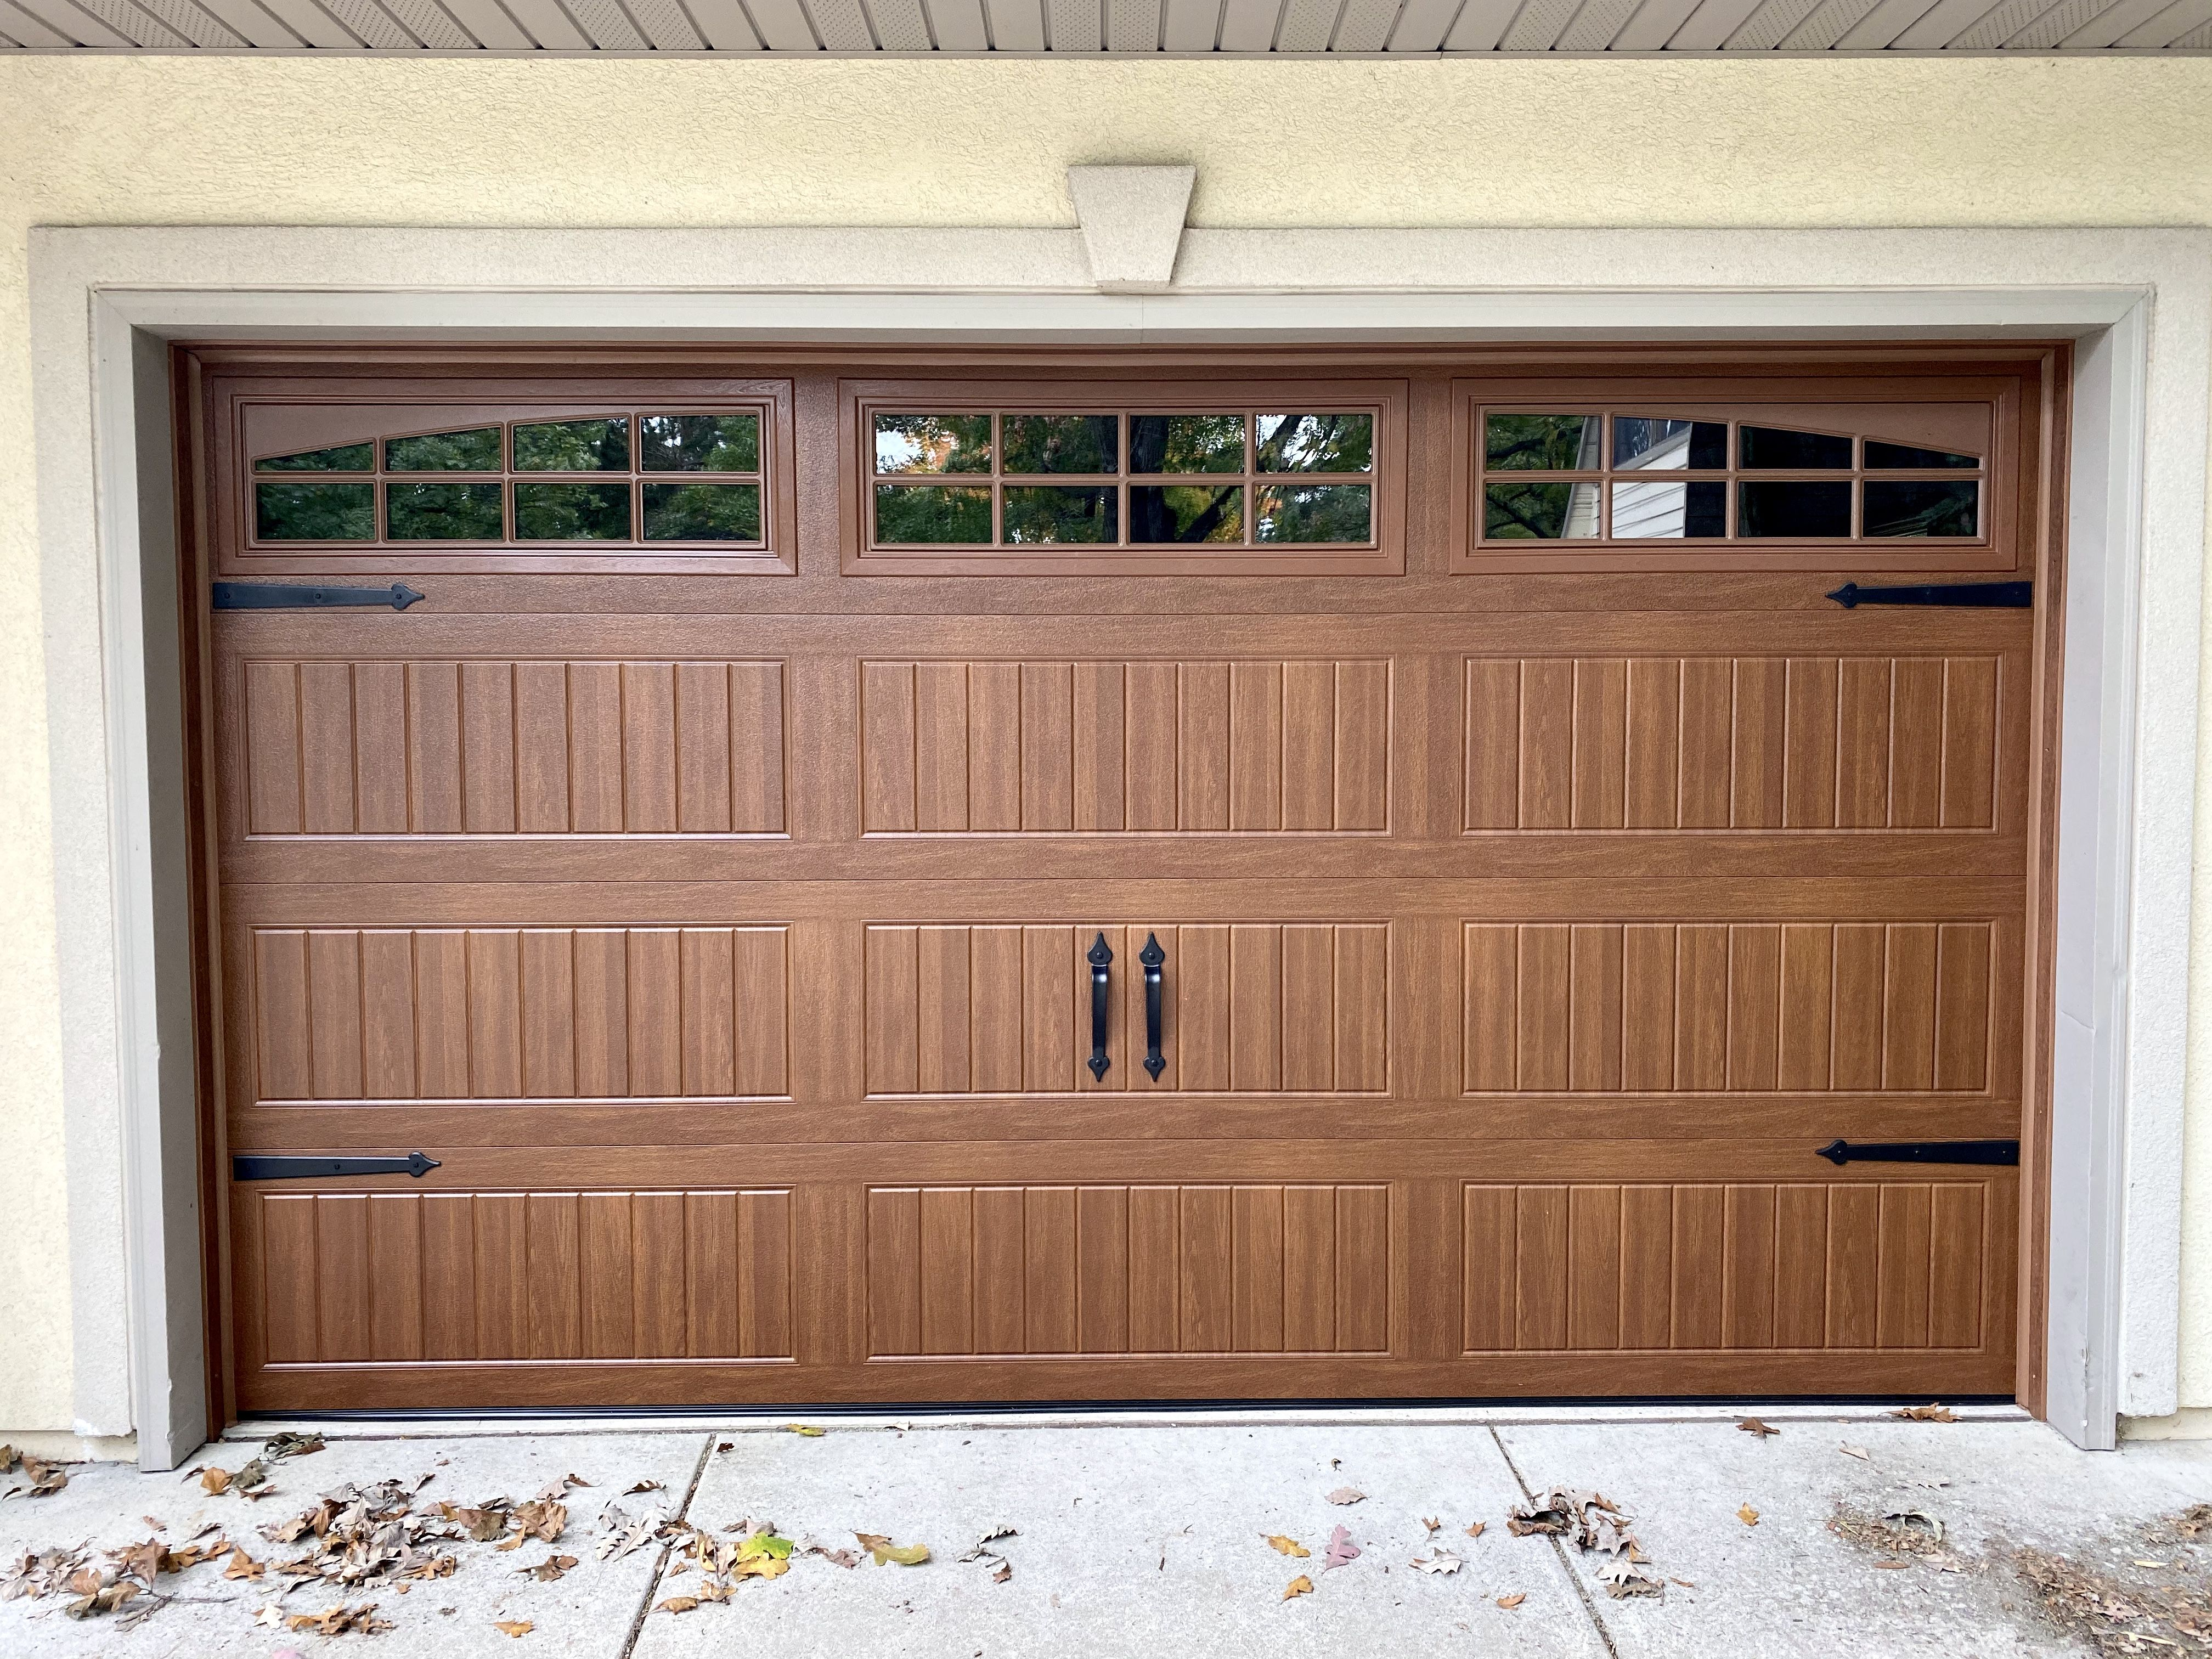 Wayne Dalton Model 8300 Garage Door In Golden Oak Installed By